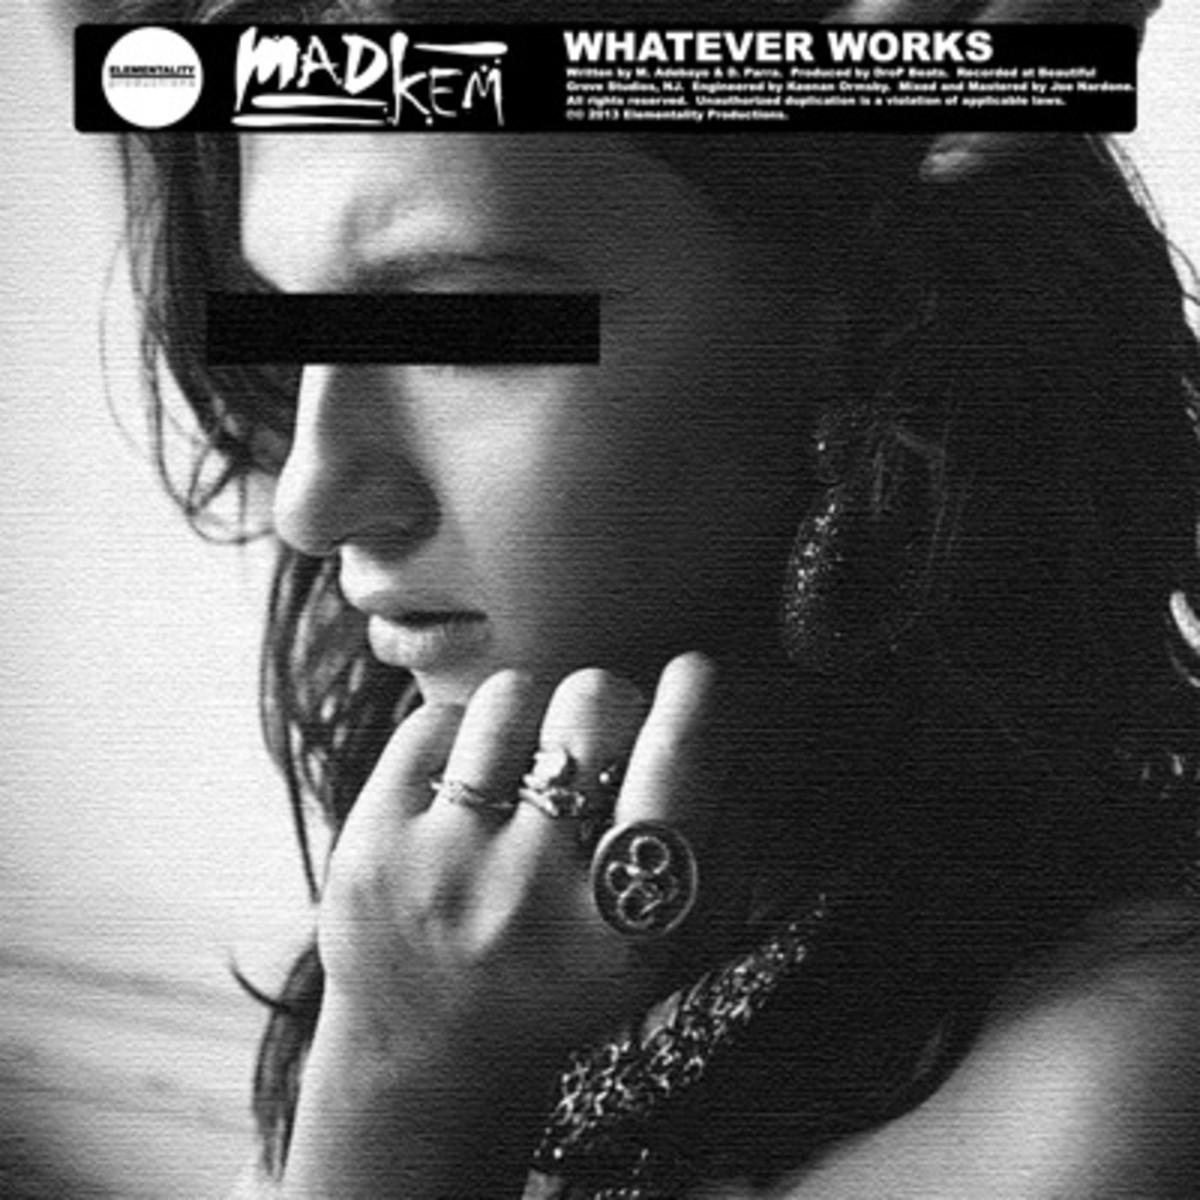 madkem-whateverworks.jpg